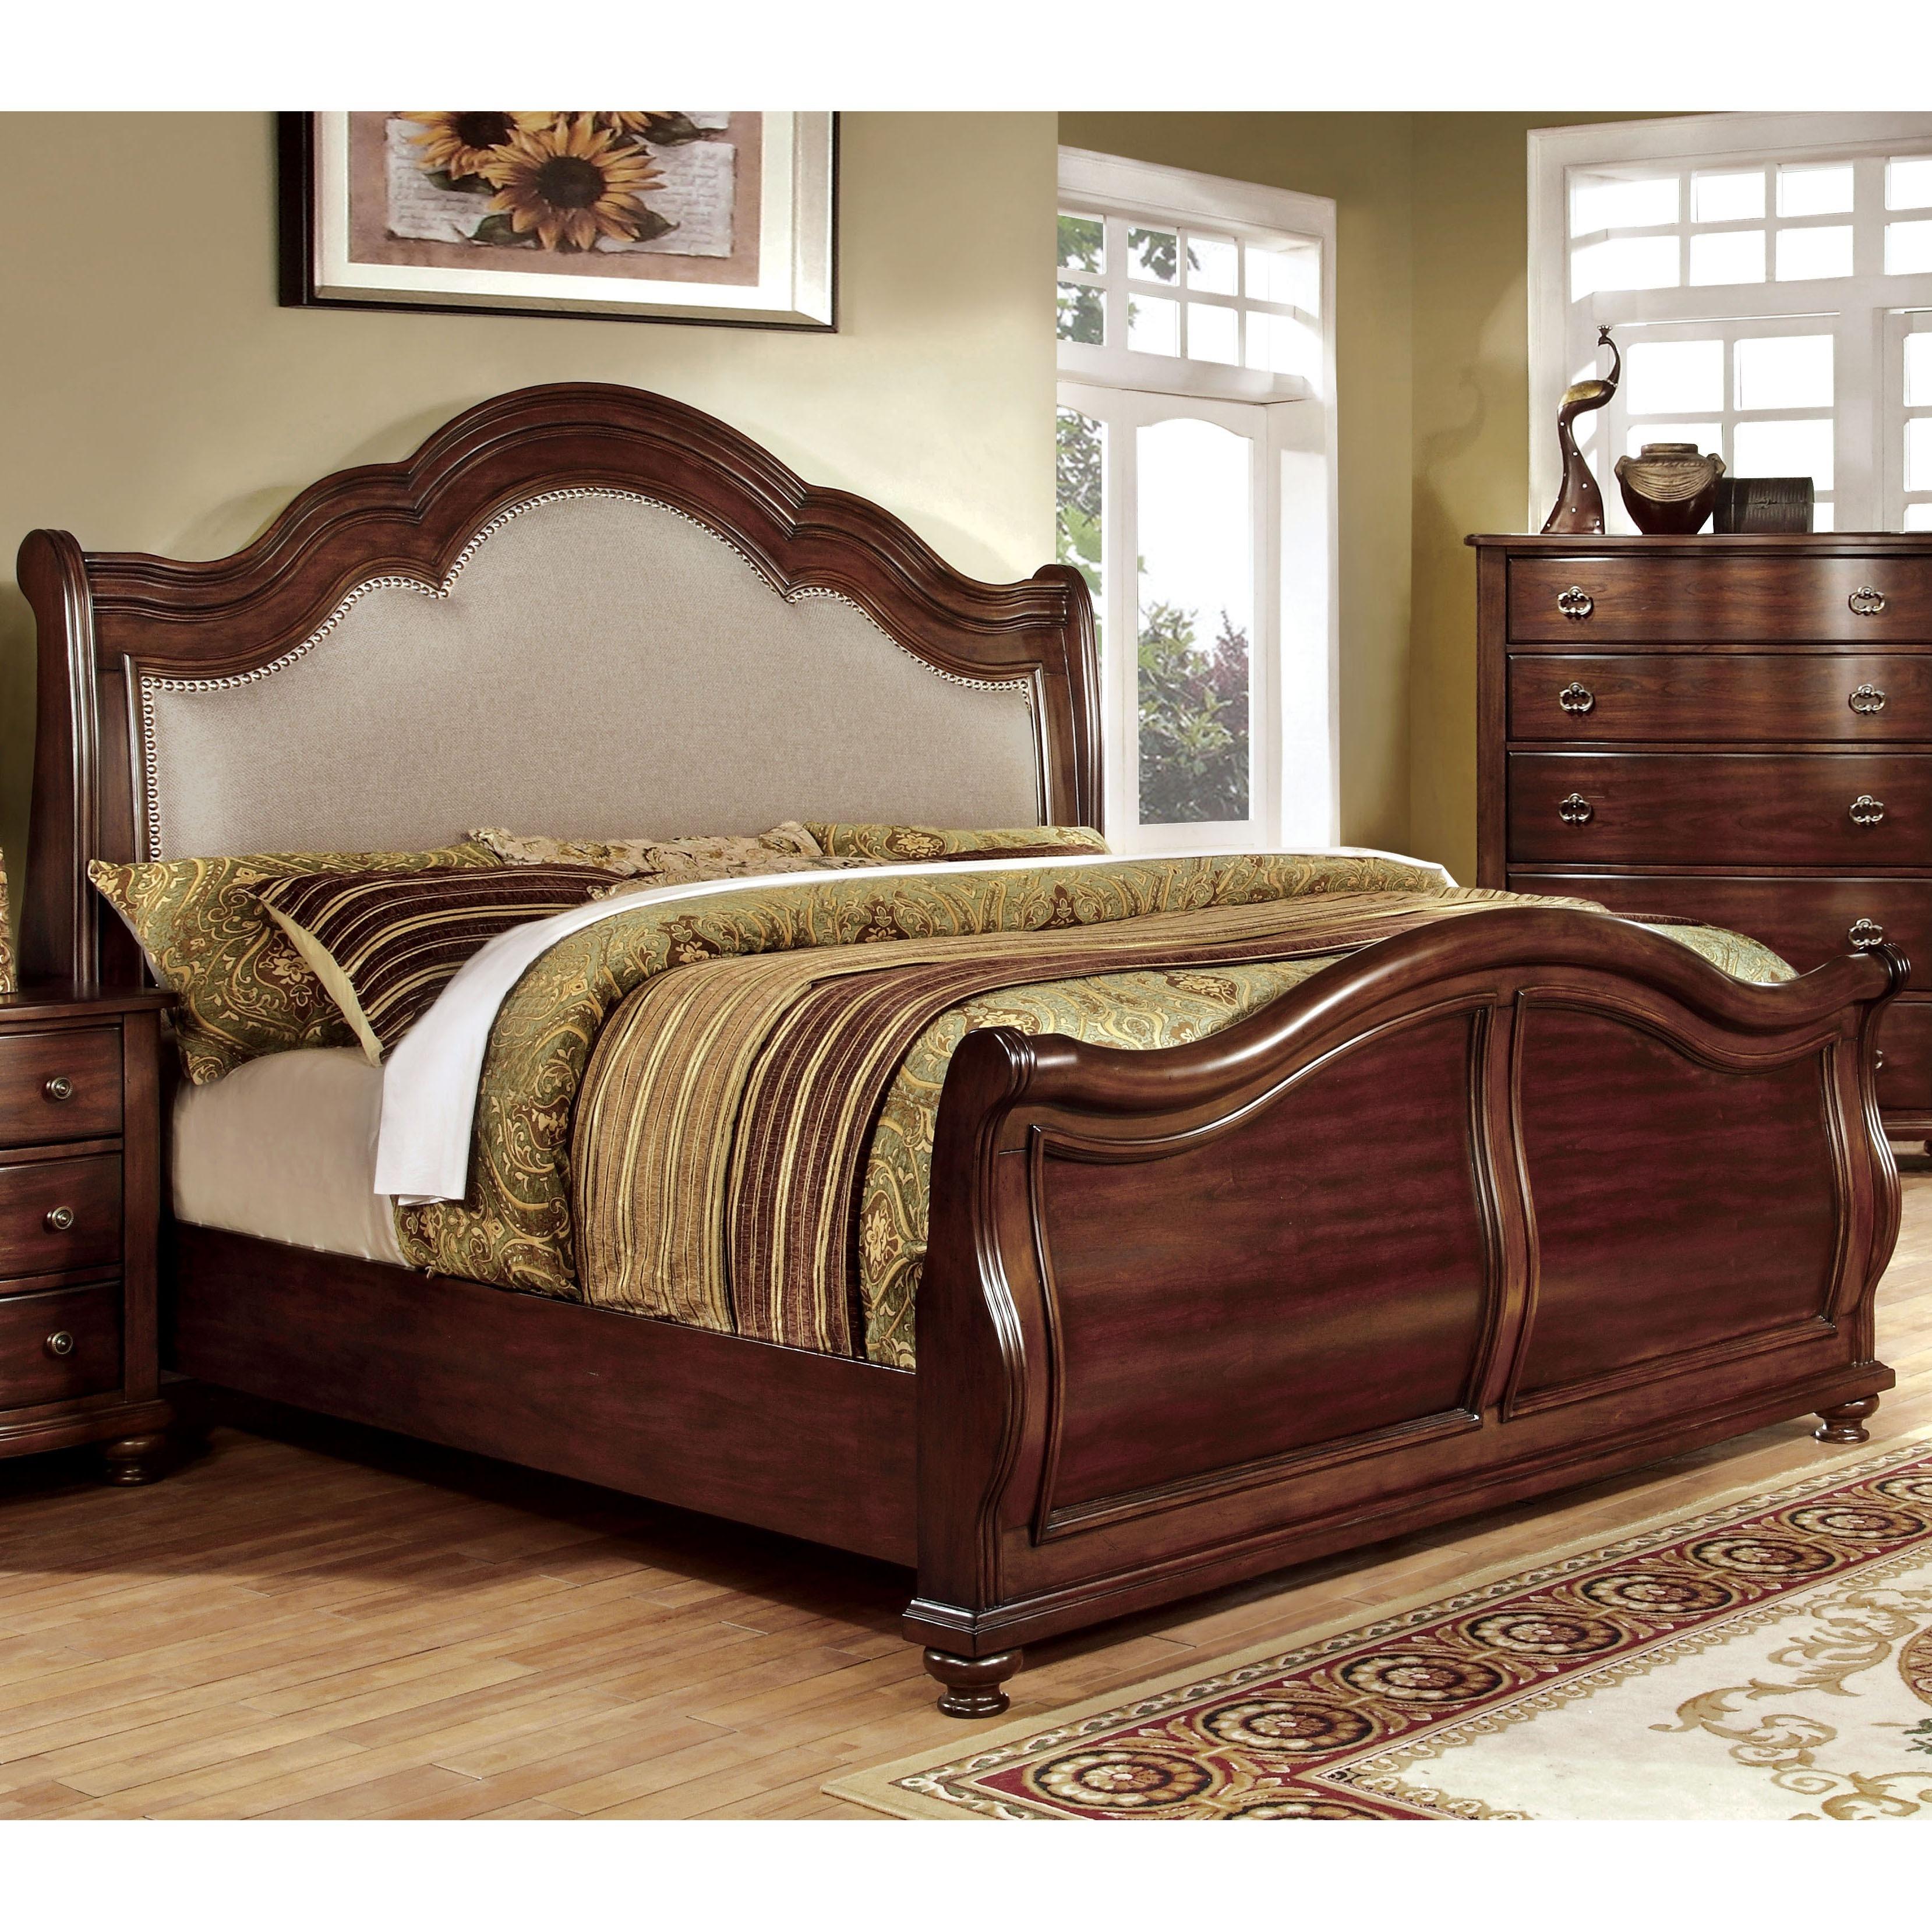 Furniture of America Ceres II Brown Cherry Platform Bed (...